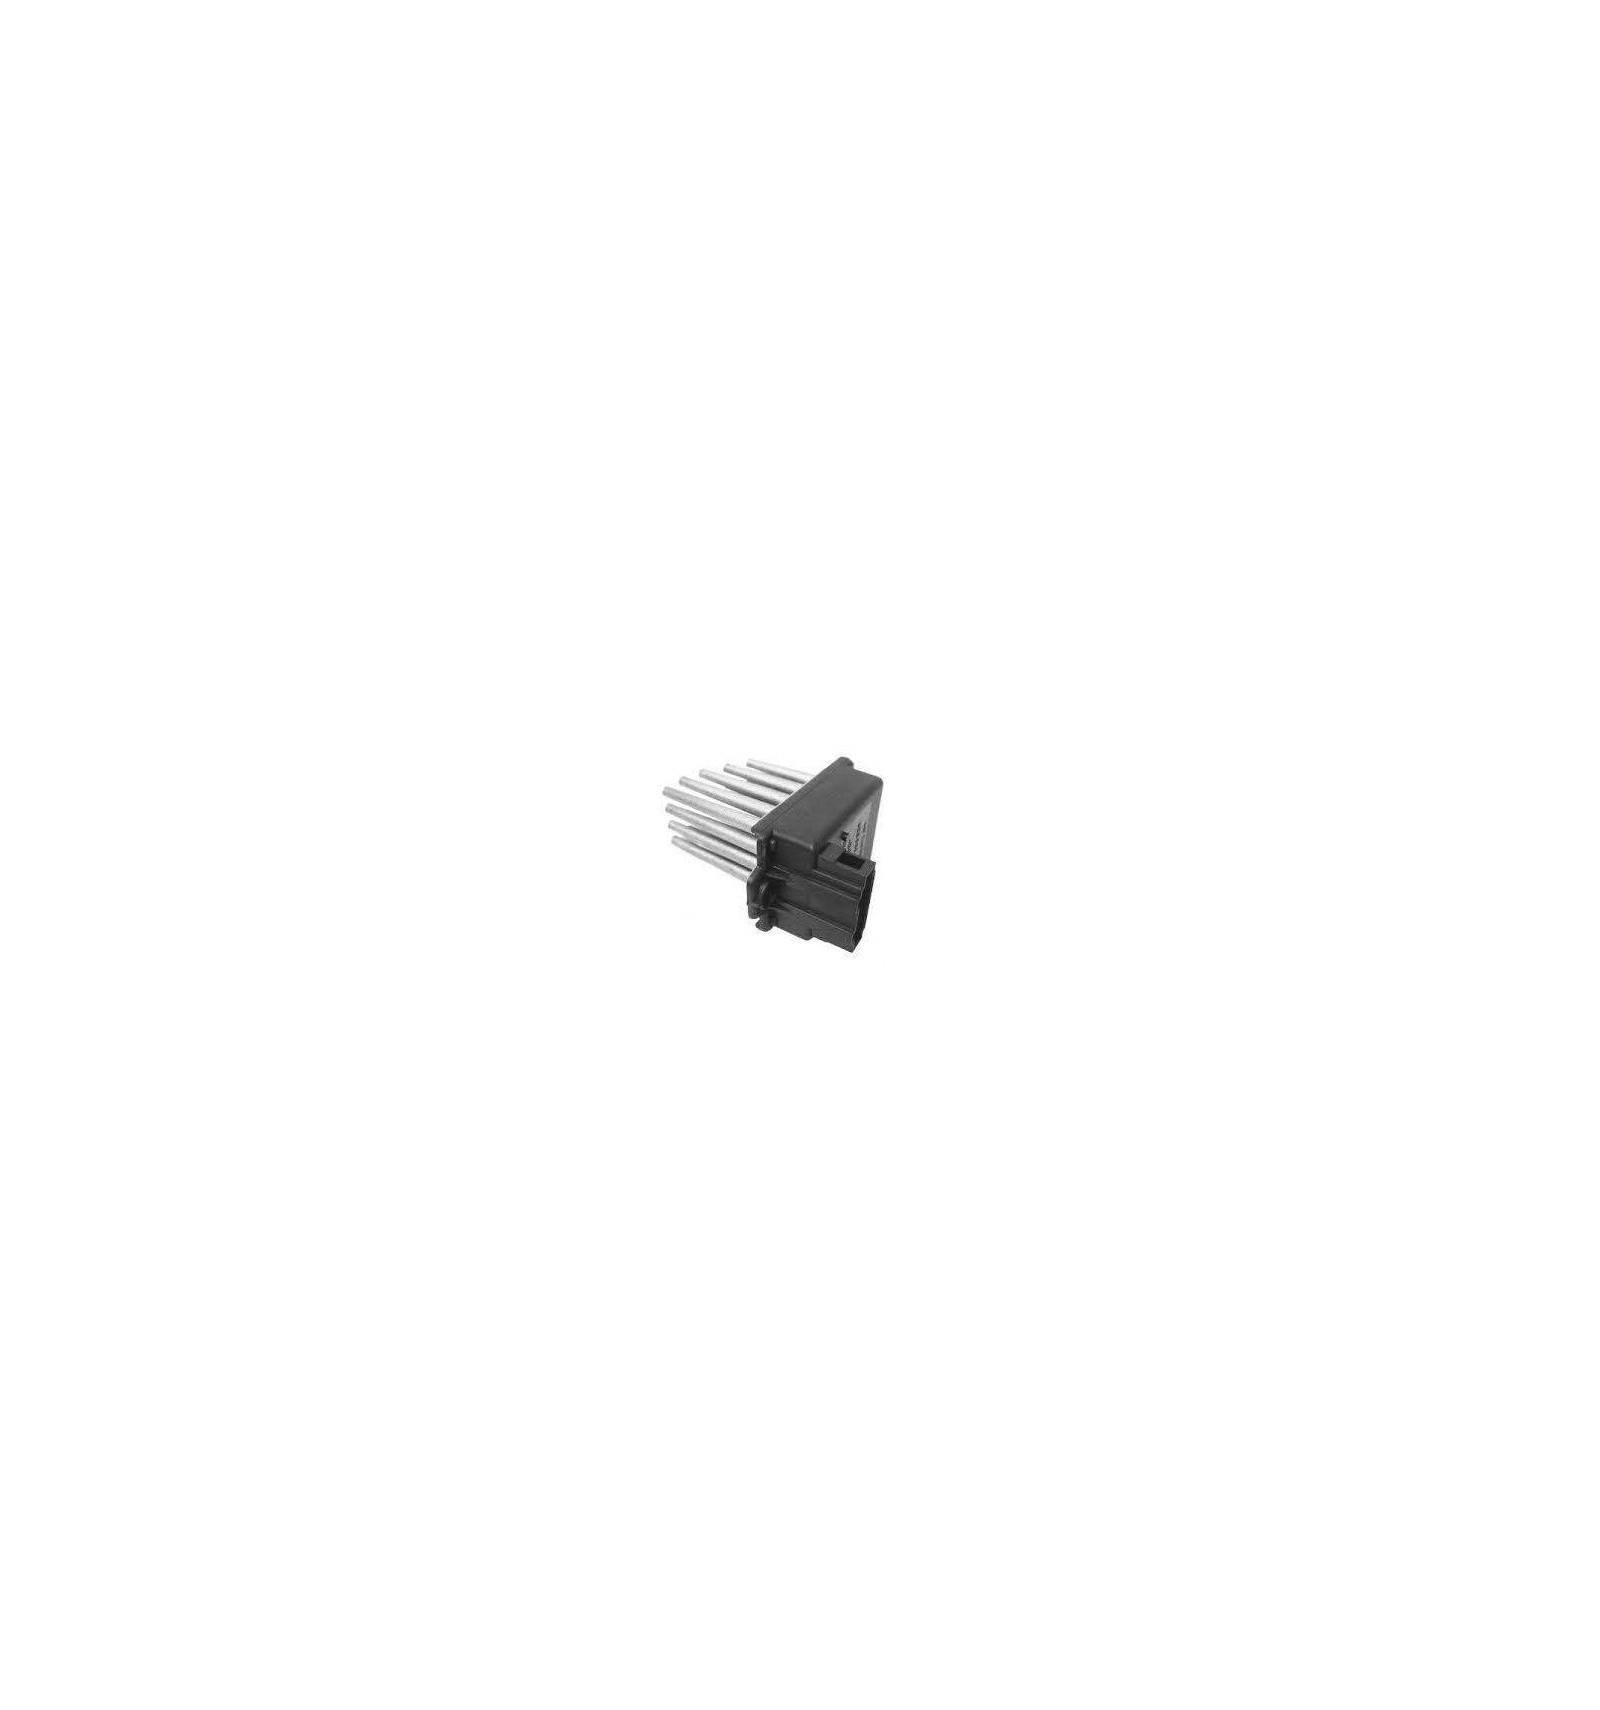 Resistance element de commande ventilation climatisation Vw Sharan